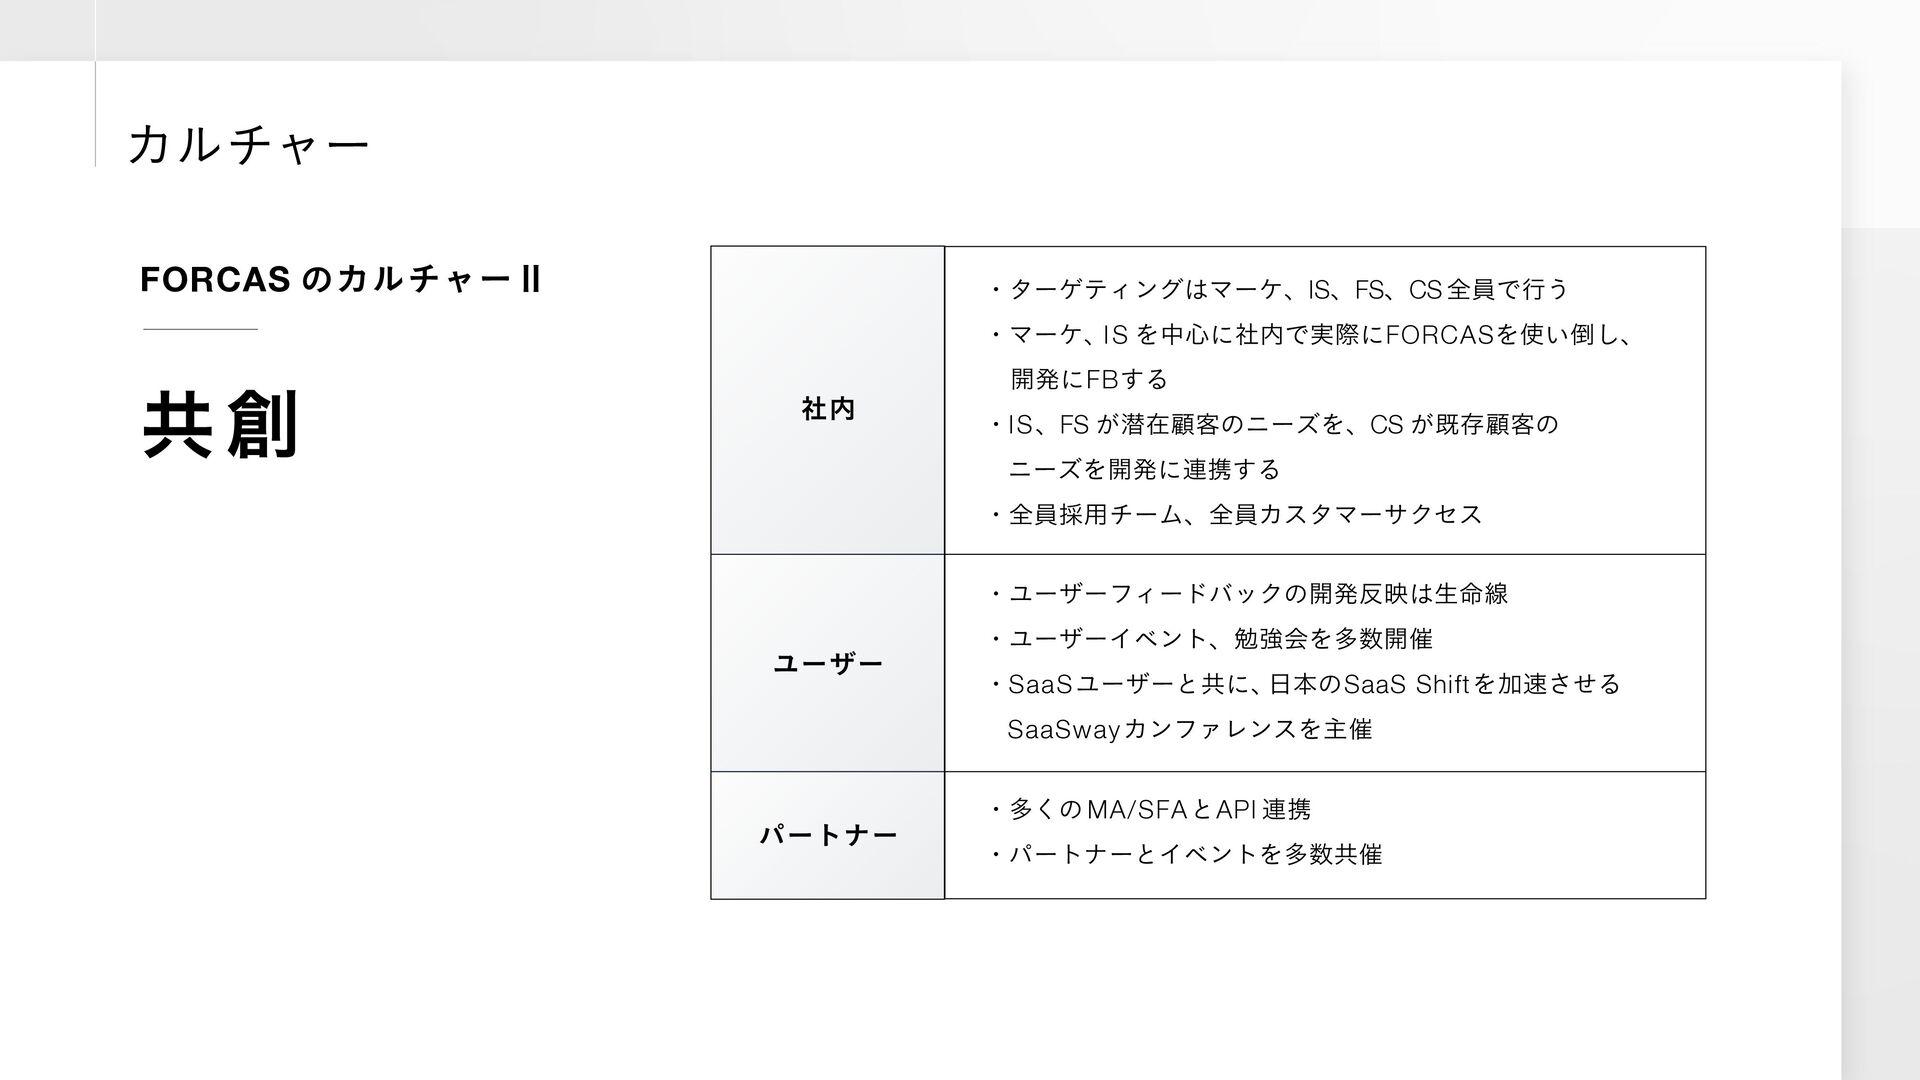 SaaSway 社員数 35 名ながら 参加者総勢1,295 名を集めた 「日本のSaaS S...